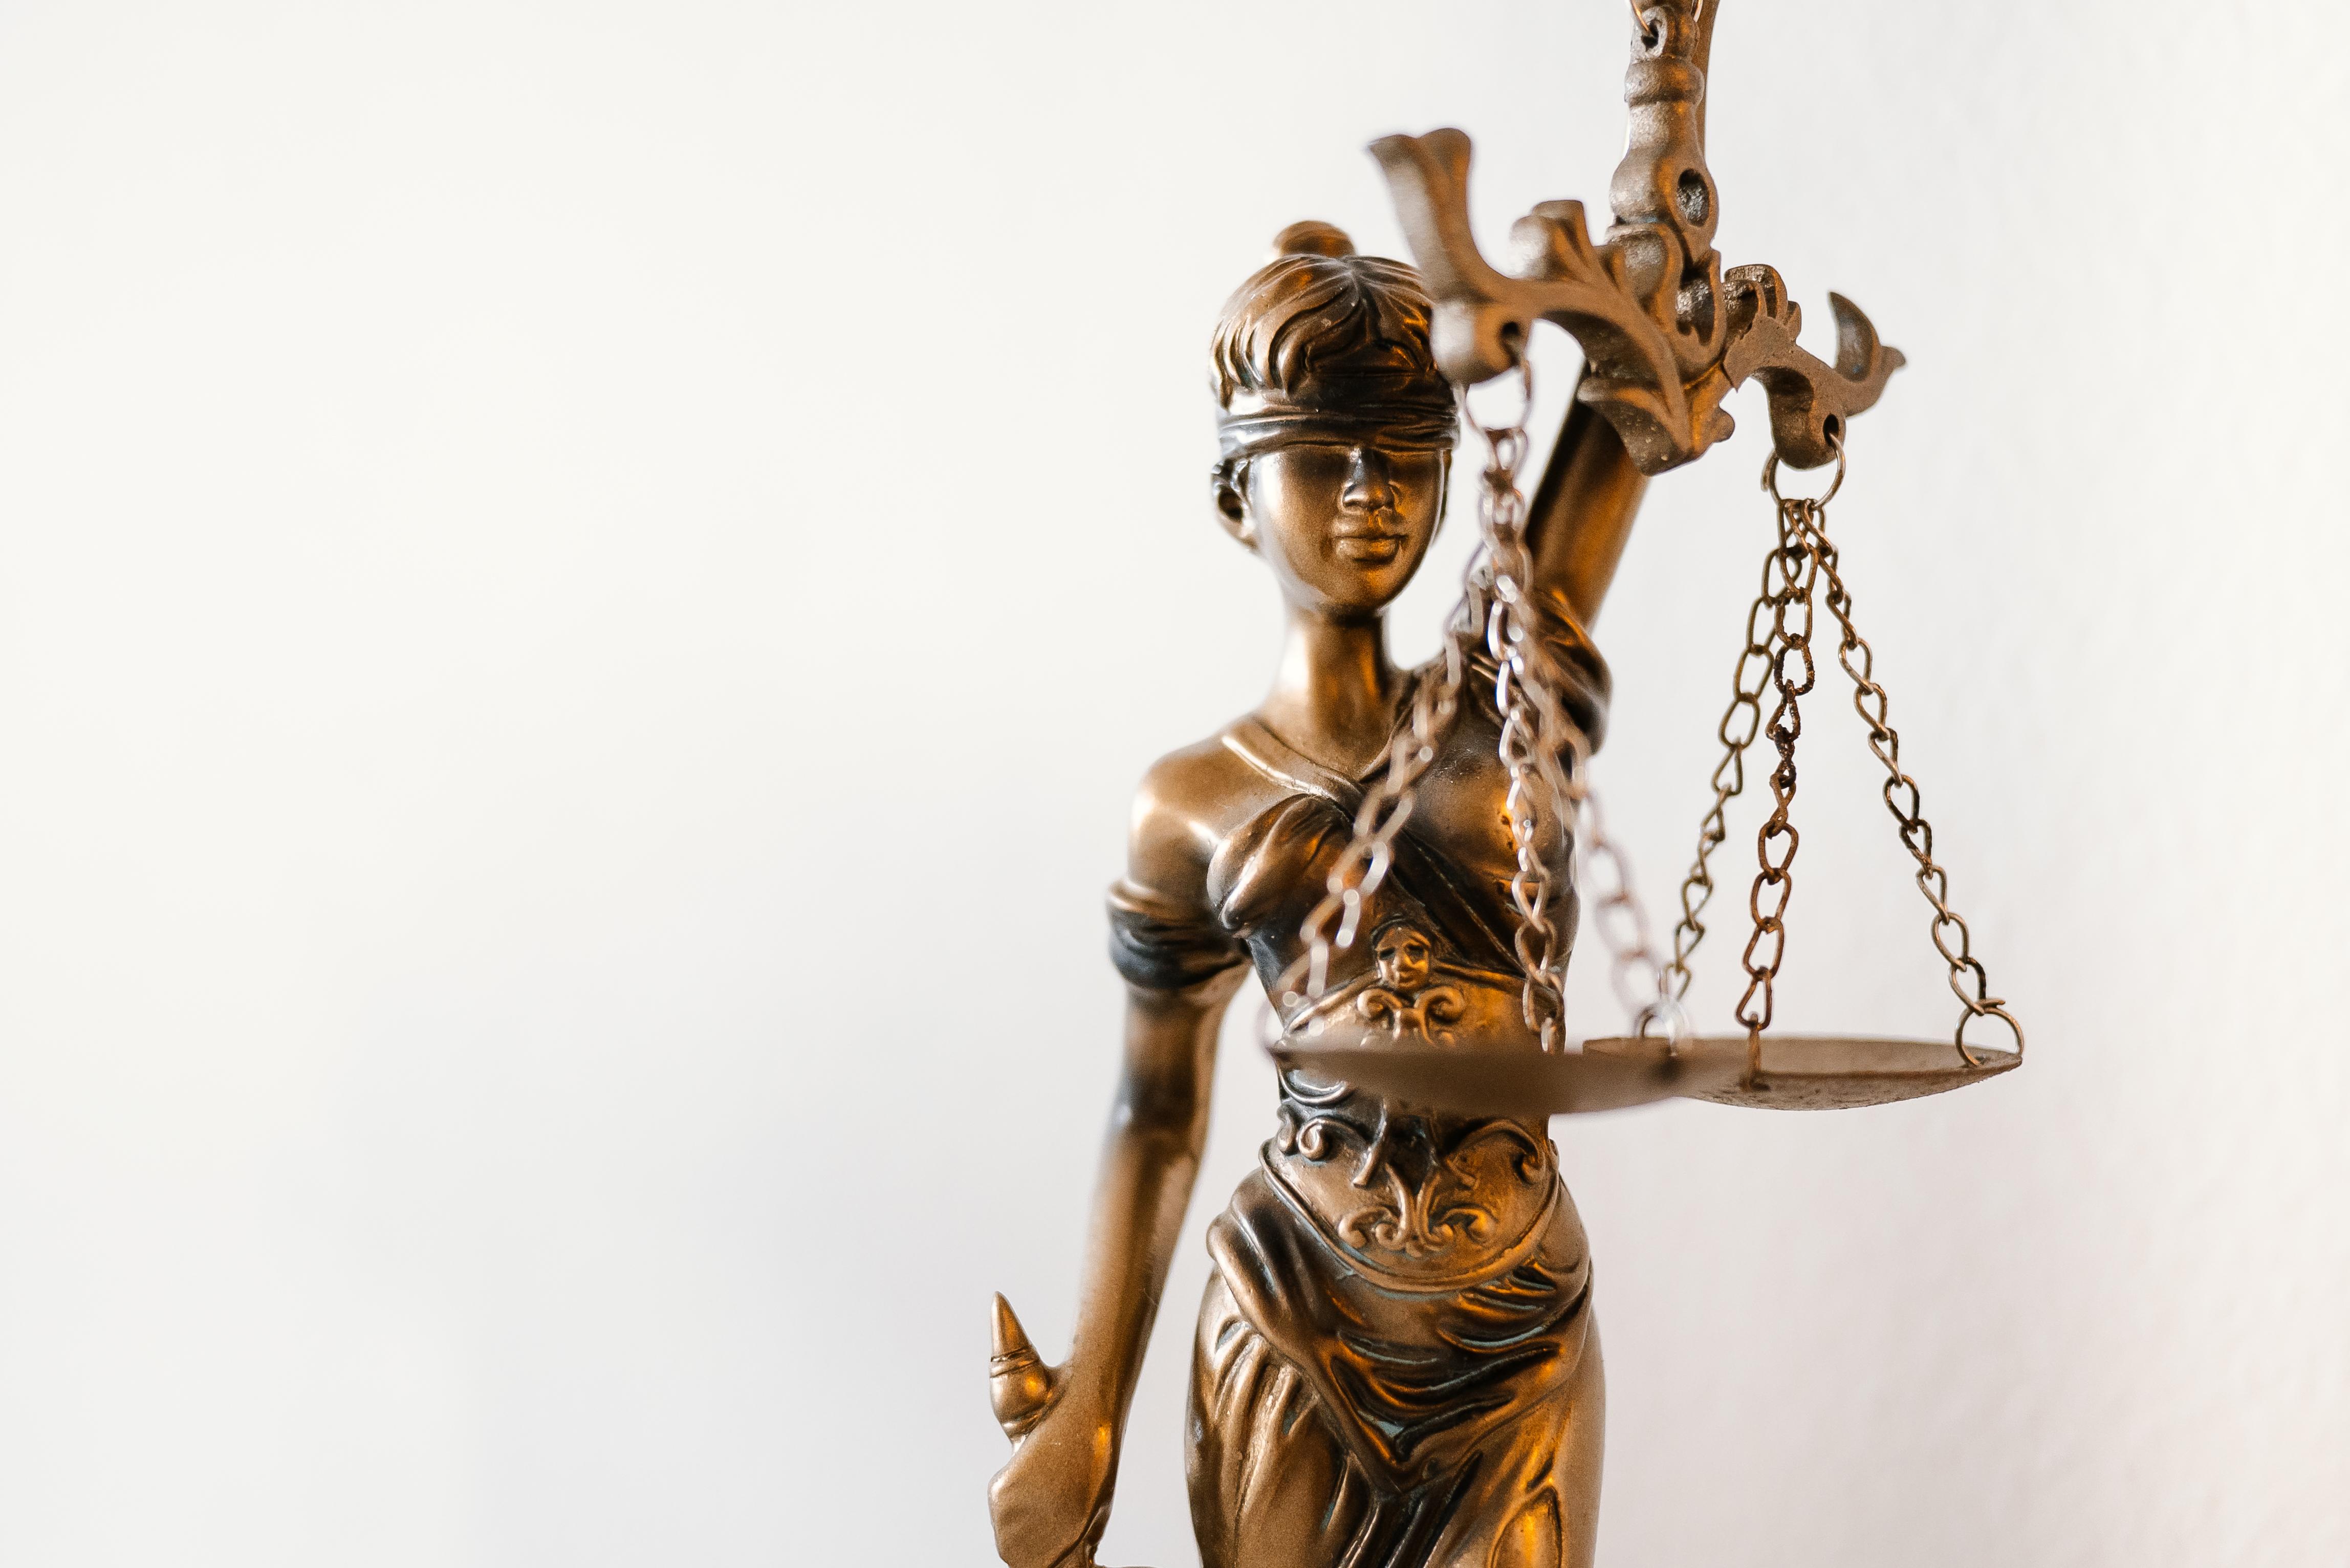 Lady-justice-picjumbo-com